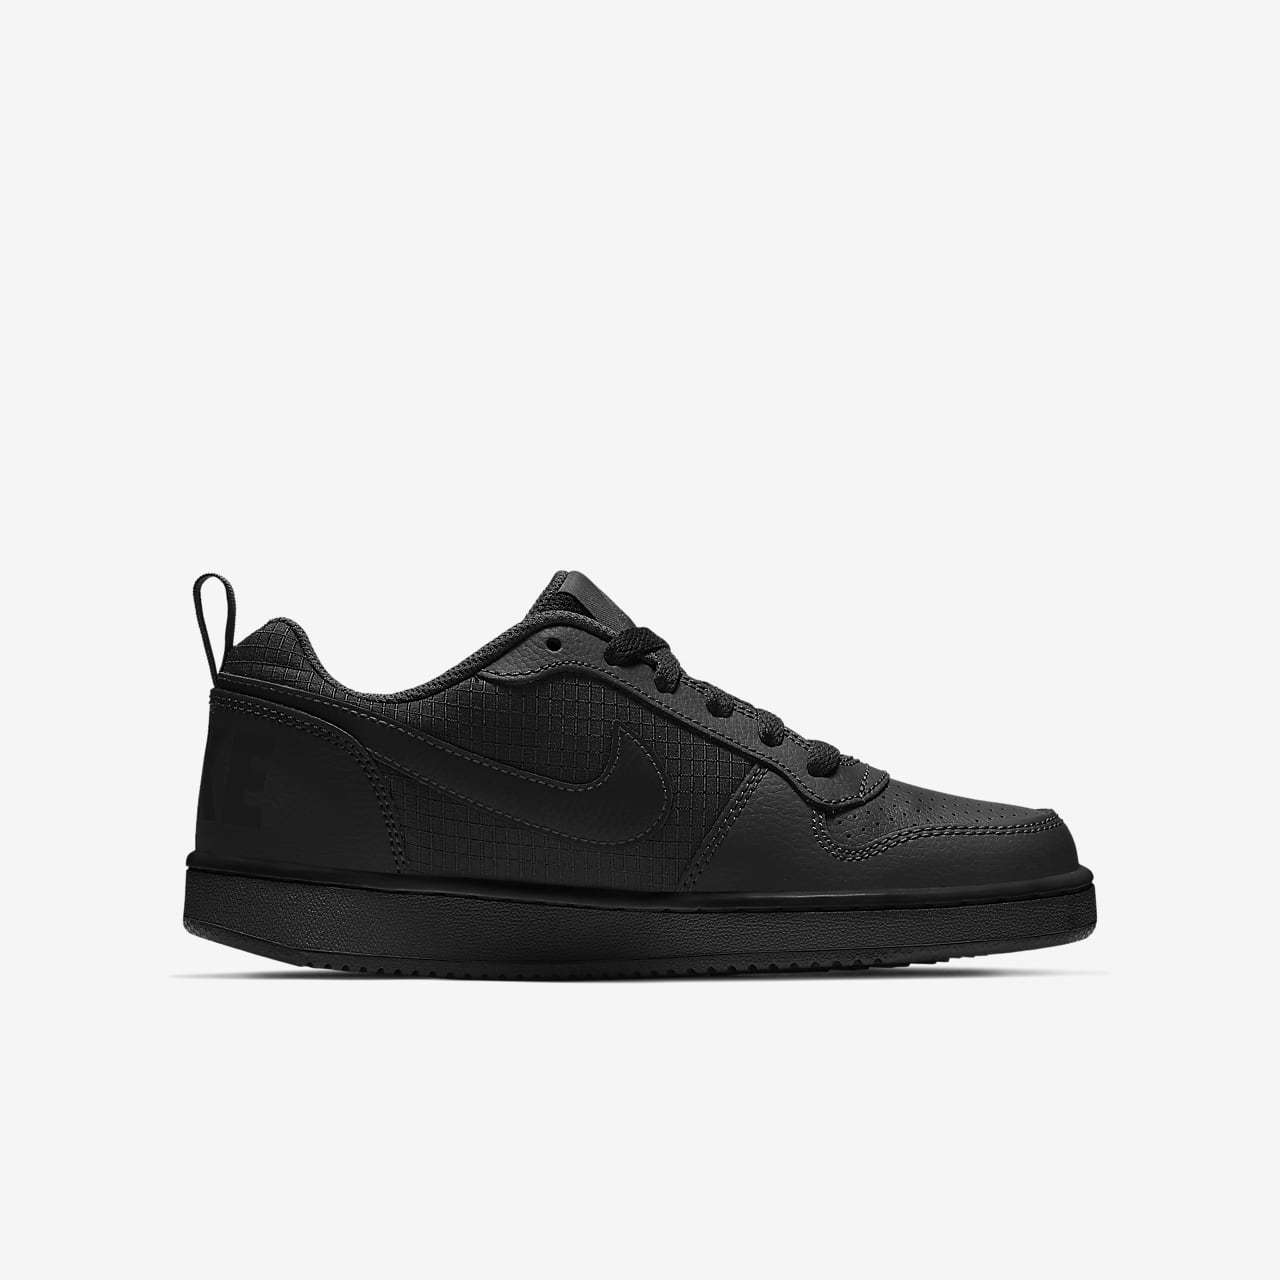 pretty nice b01f6 d5729 Nikecourt borough low older kids shoe jpg 1280x1280 Court nike borough  philippines price